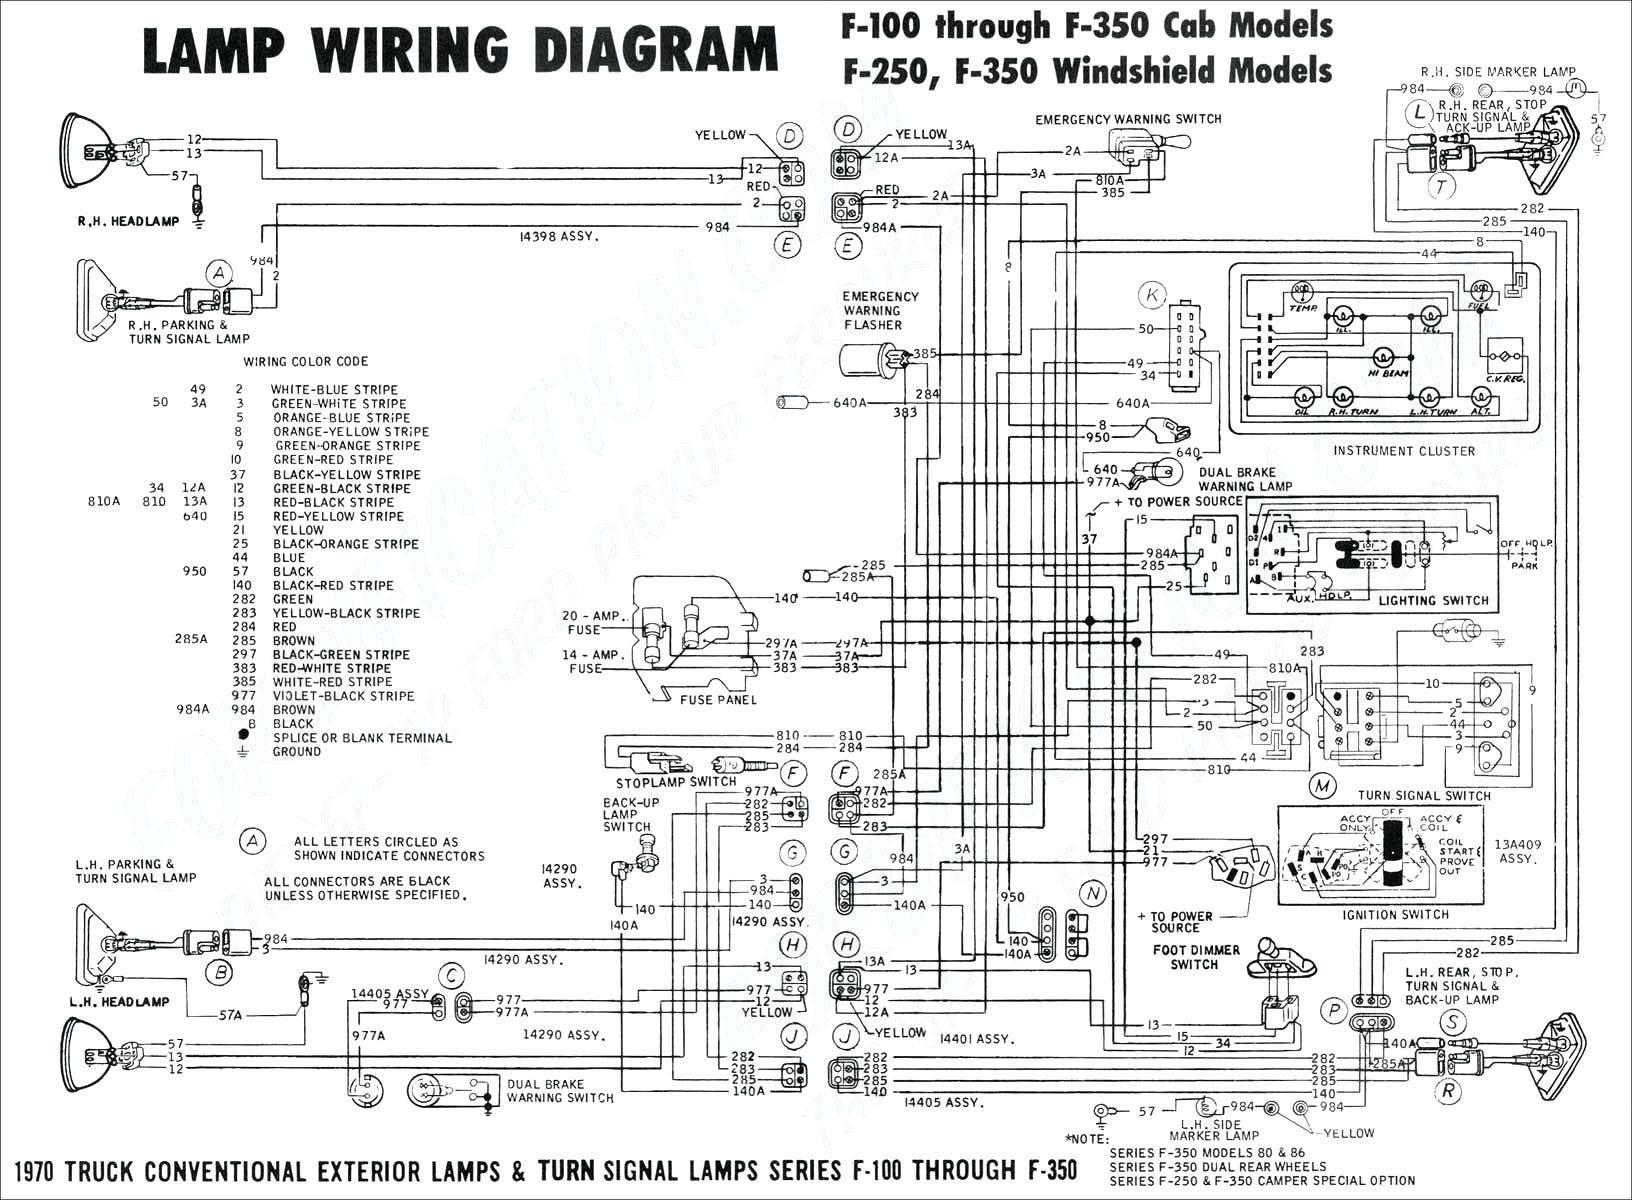 1999 ford F250 Tail Light Wiring Diagram Pool Light Wiring Diagram Of 1999 ford F250 Tail Light Wiring Diagram